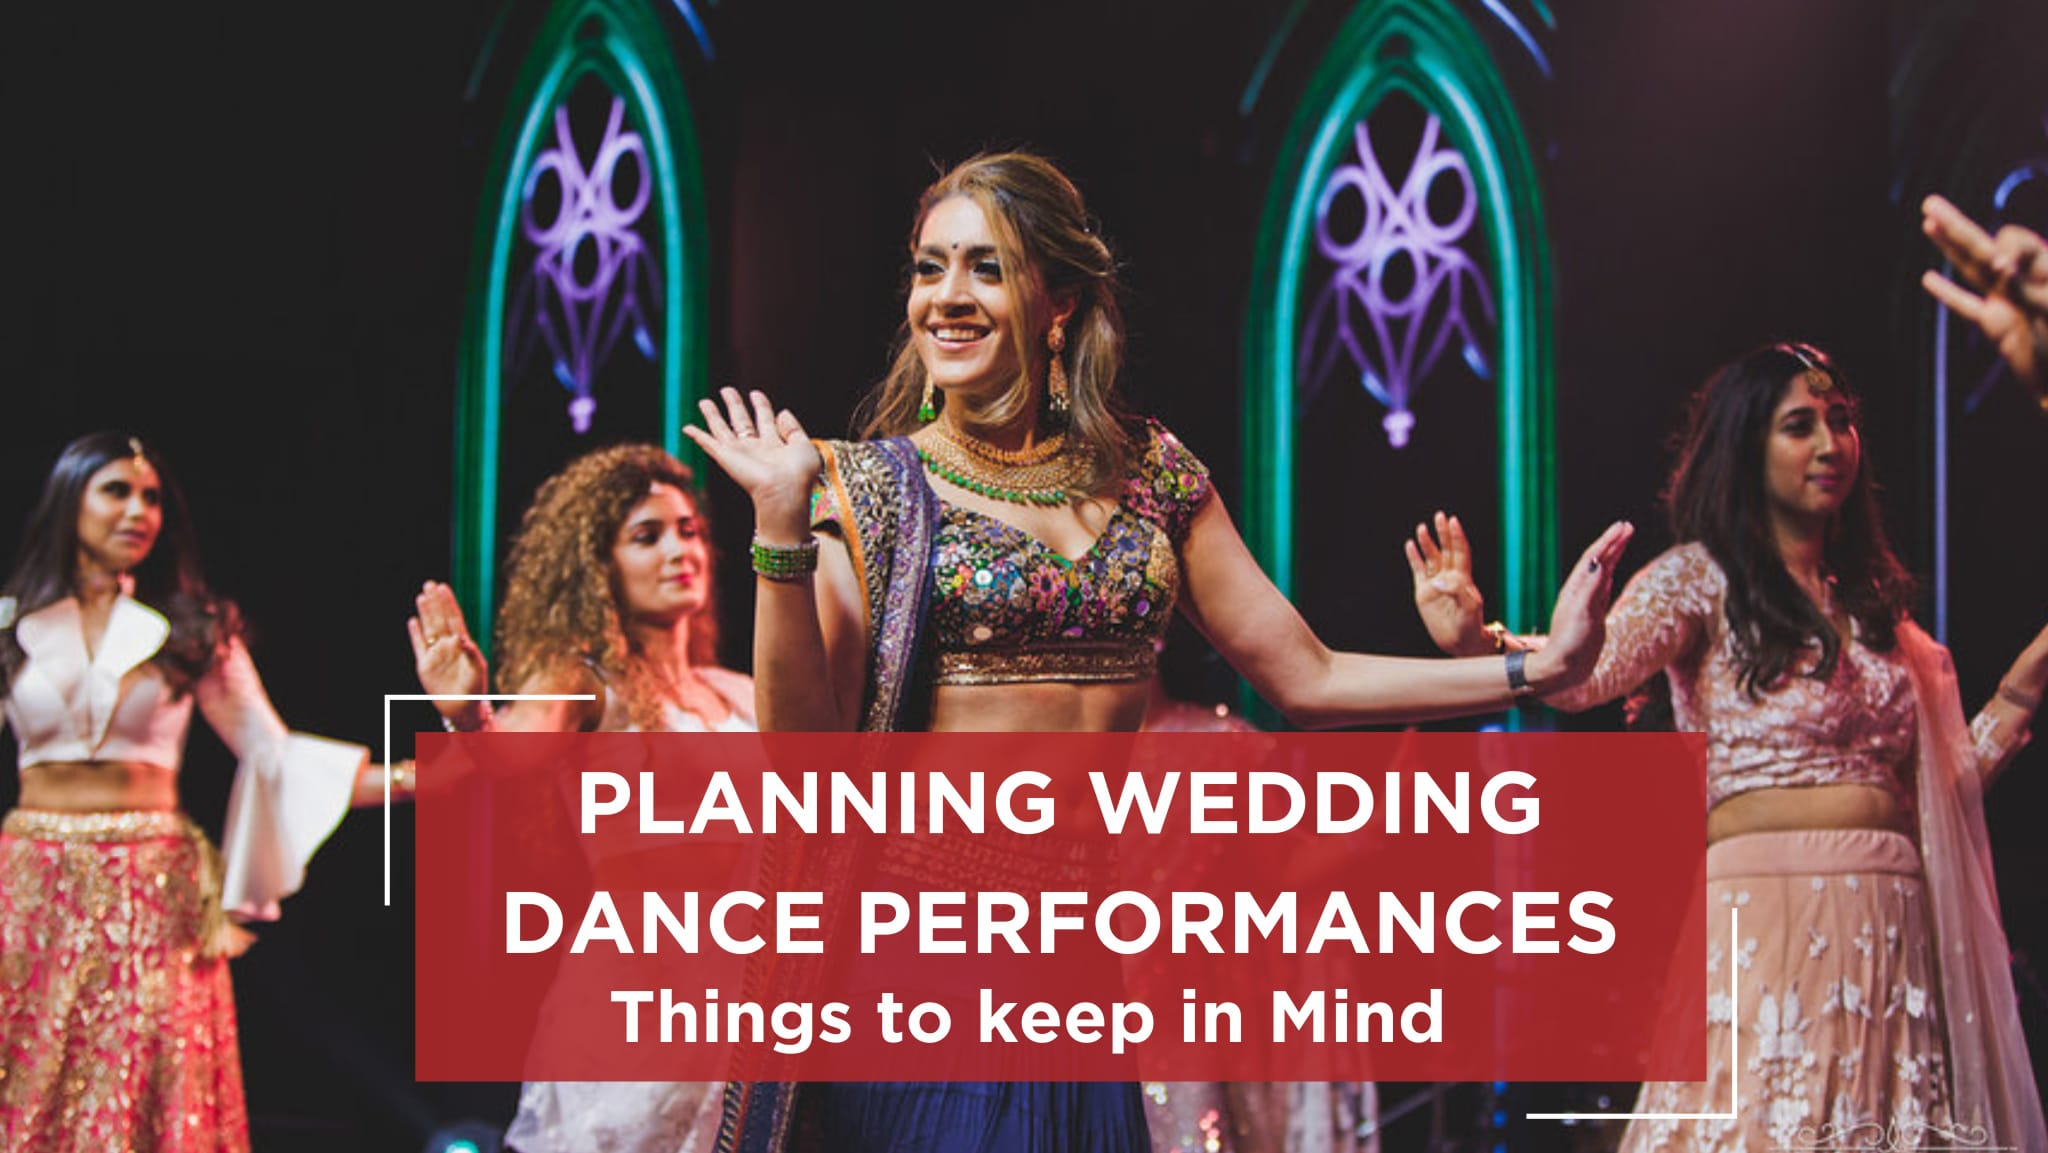 Planning your wedding dance performance, wedding dance choreography, wedding choreographer, sangeet choreography, choreo n concept weddings